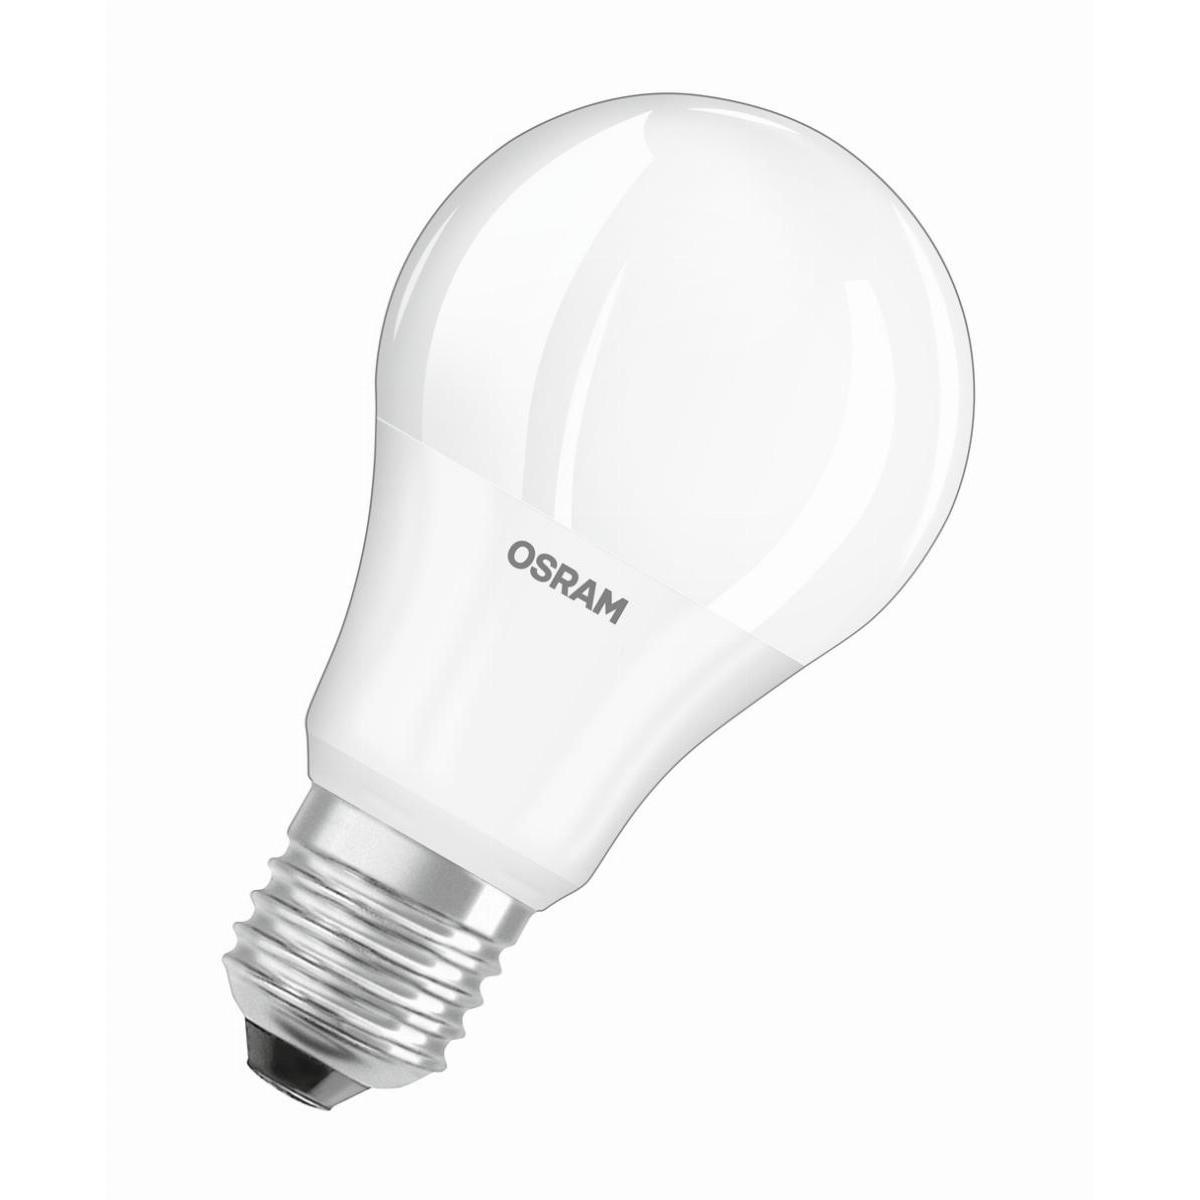 Unikalne Żarówka LEDVANCE LED VALUE CLASSIC CLA 40 6W (40W) 470lm E27 2700K XD36